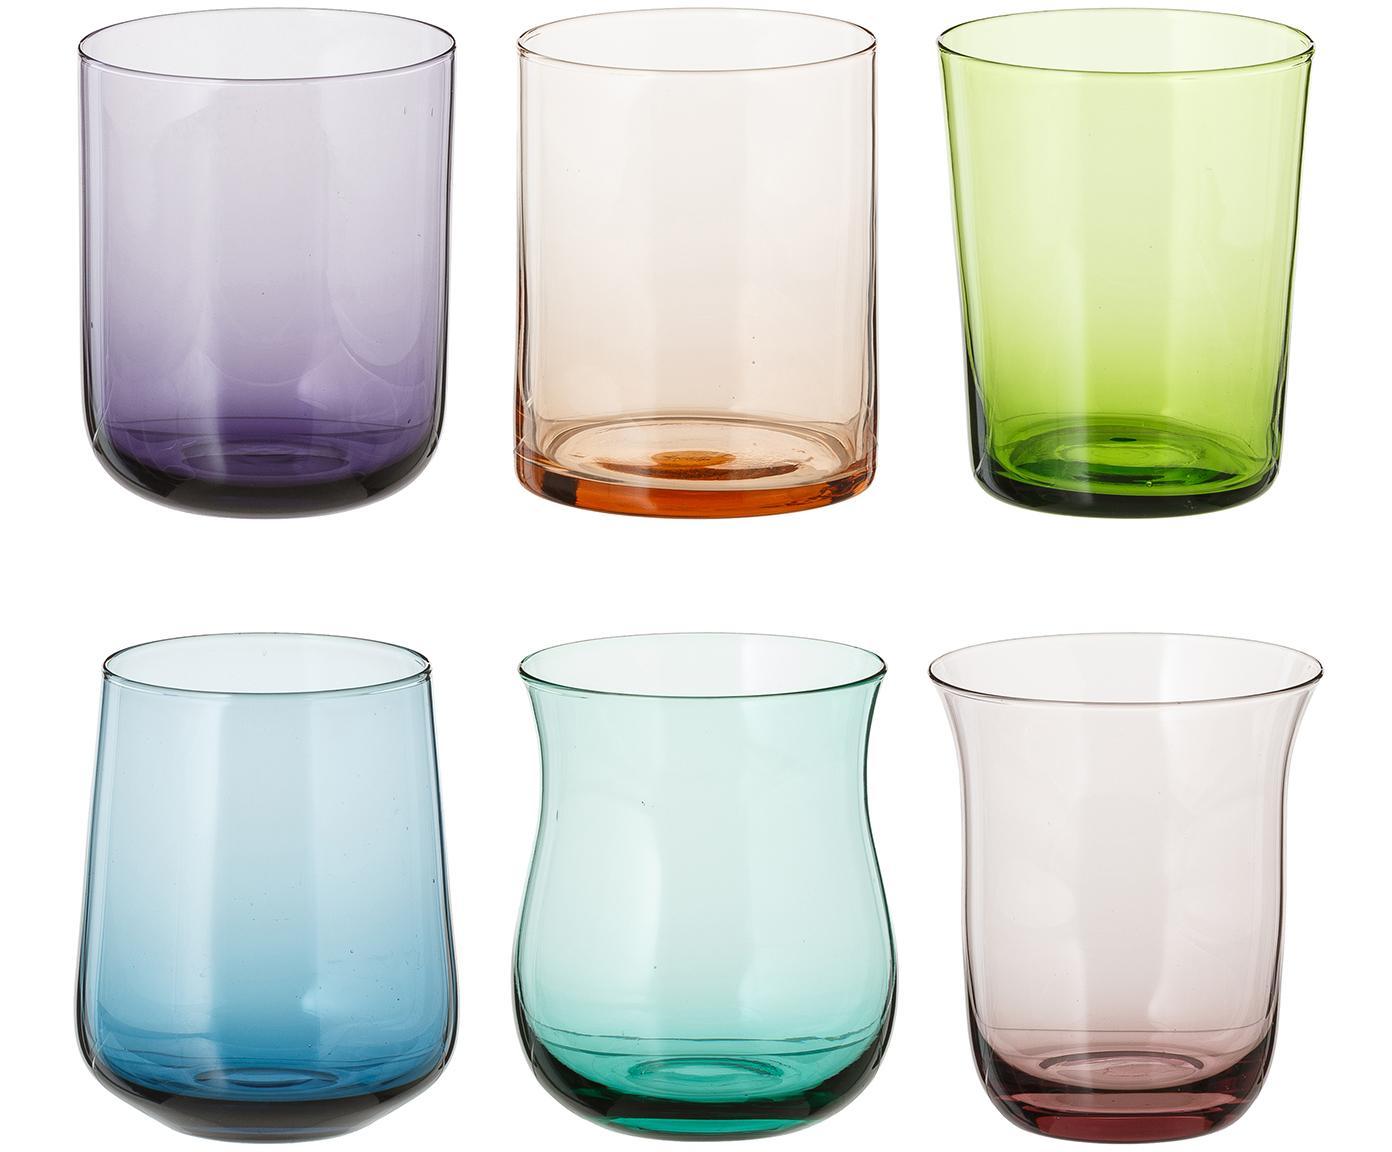 Mondgeblazen waterglazenset Desigual, 6-delig, Mondgeblazen glas, Multicolour, Ø 8 x H 10 cm